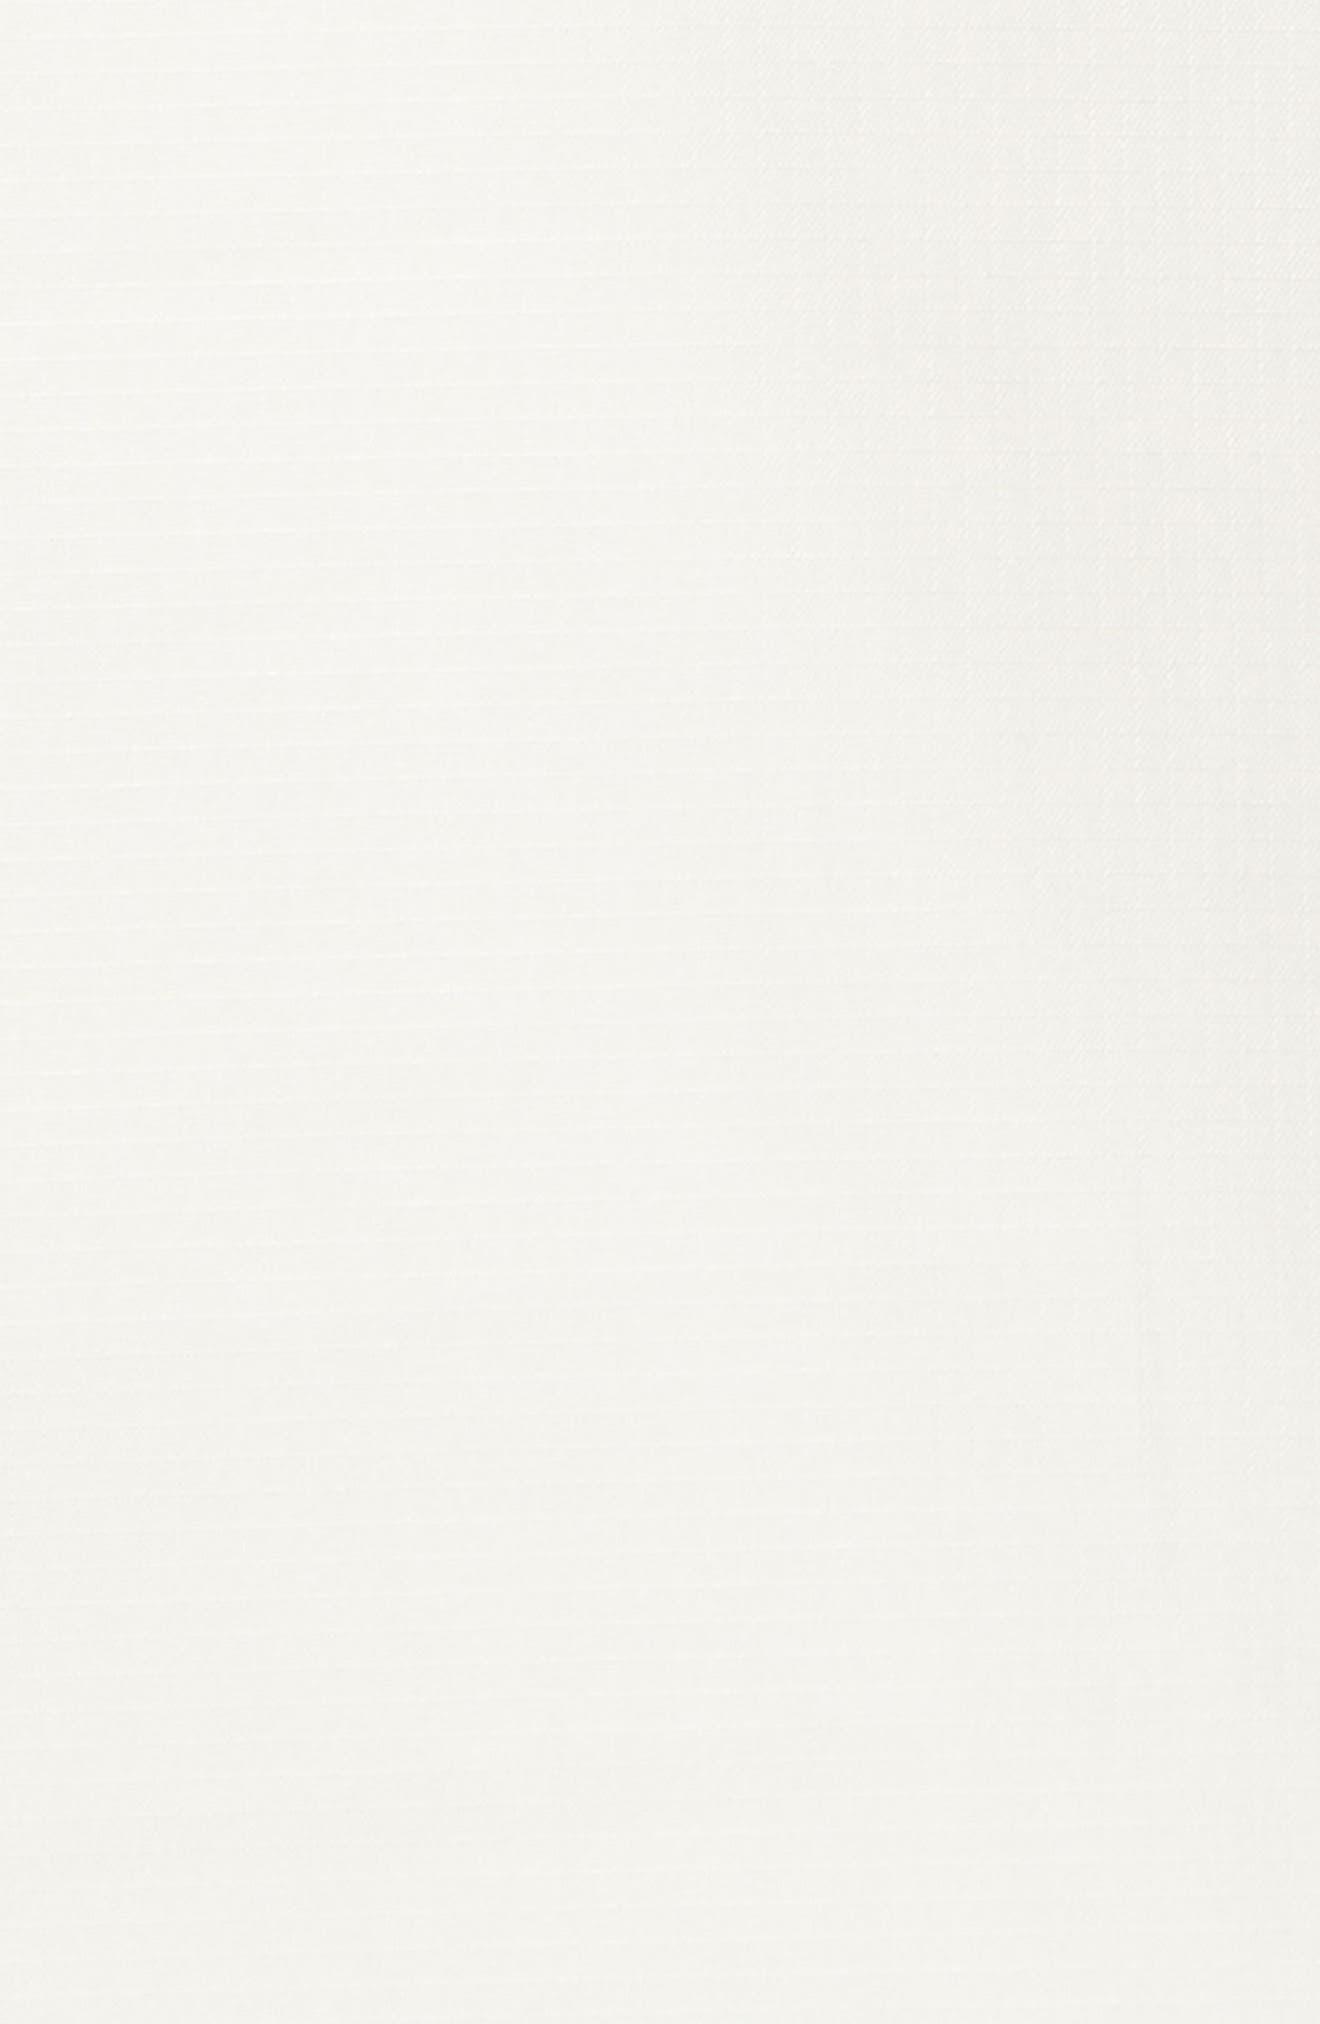 Fanorak Pullover,                             Alternate thumbnail 5, color,                             Vintage White Multi